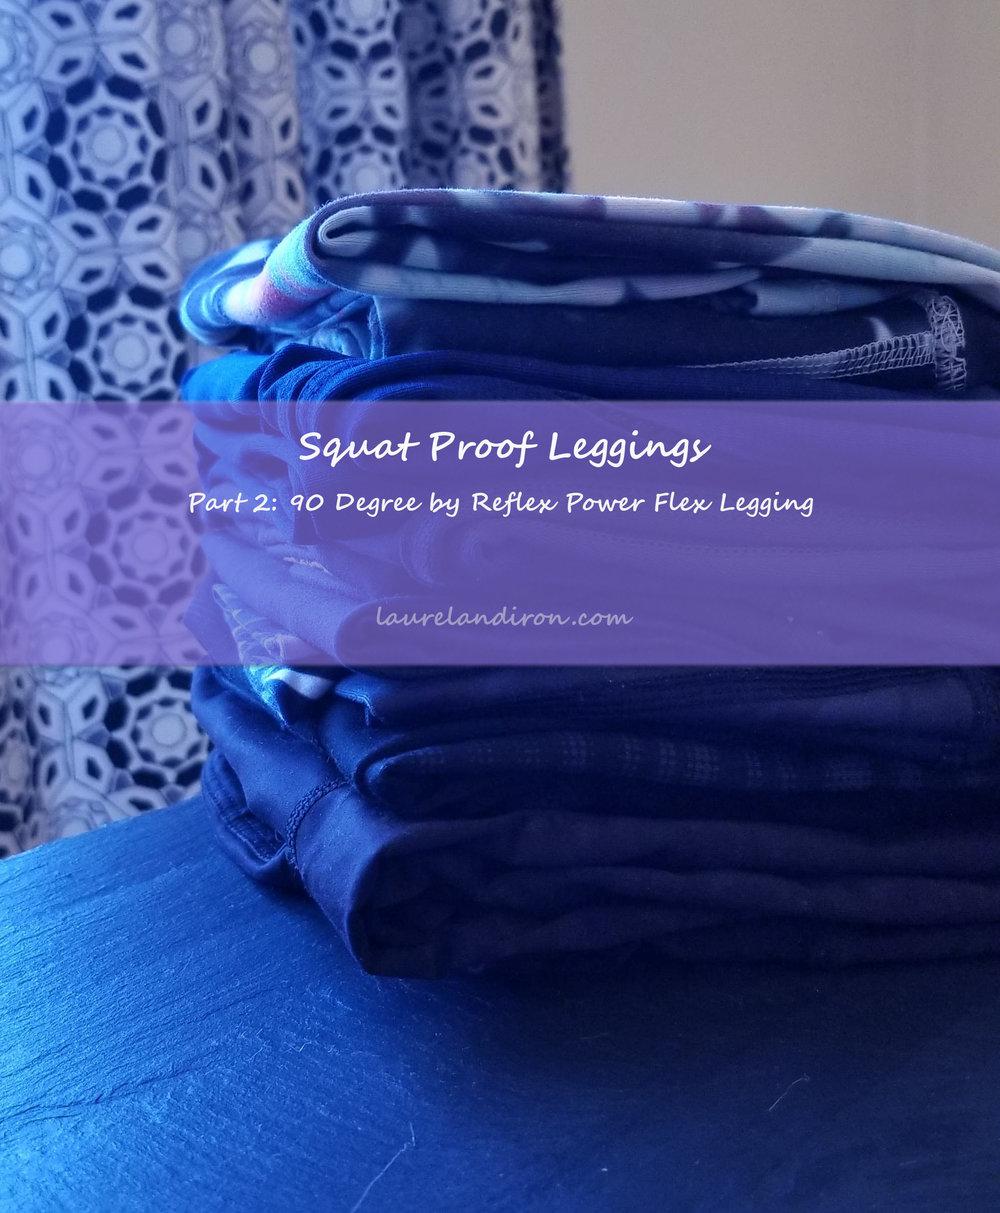 8a2707fc7f squat proof leggings part 2: 90 Degree by Reflex Power Flex Capri ...